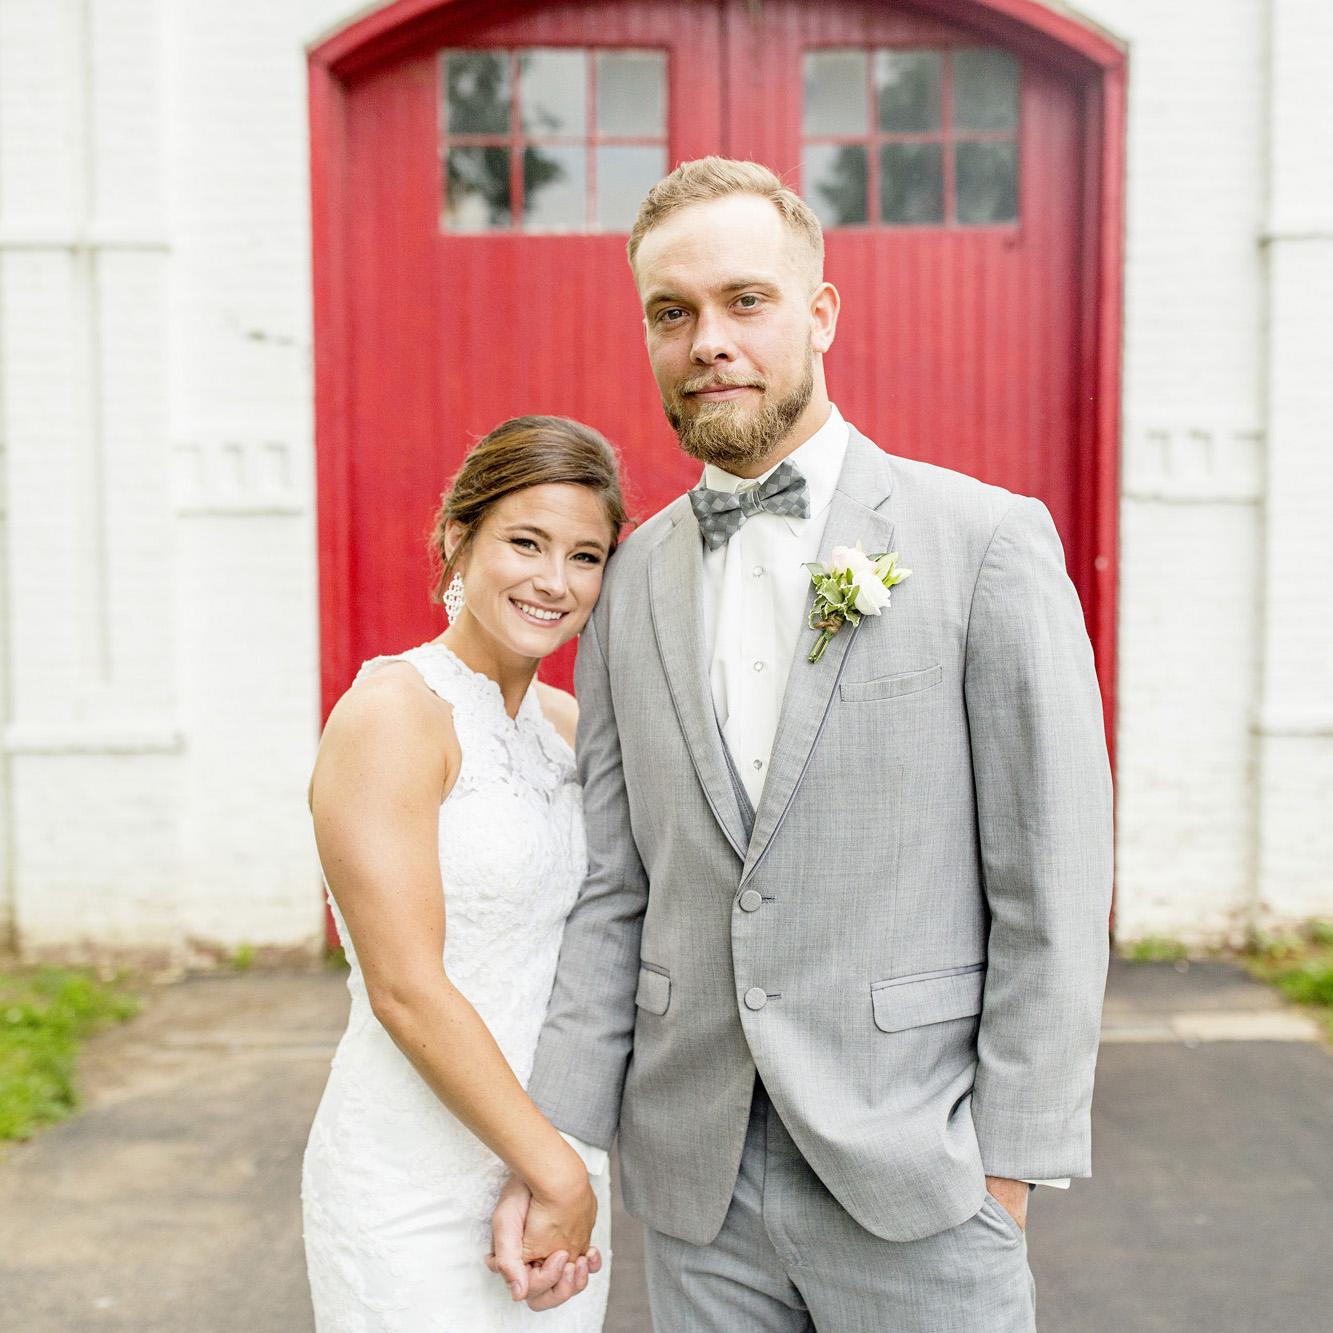 Seriously_Sabrina_Photography_Lexington_Kentucky_Round_Barn_Red_Mile_Stable_of_Memories_Wedding_Hart_40.jpg